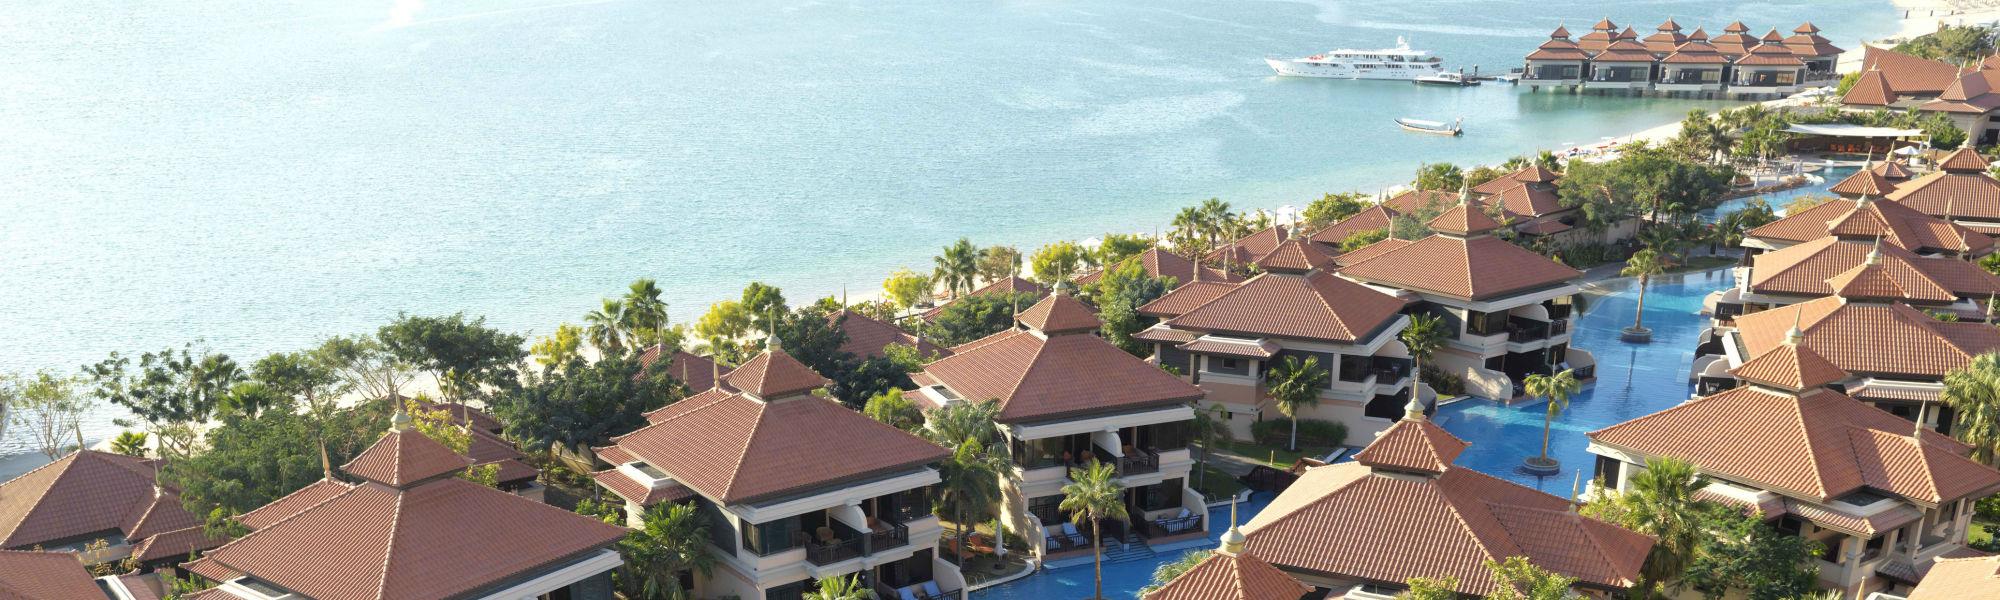 Aerial Day View of the Anantara The Palm Dubai